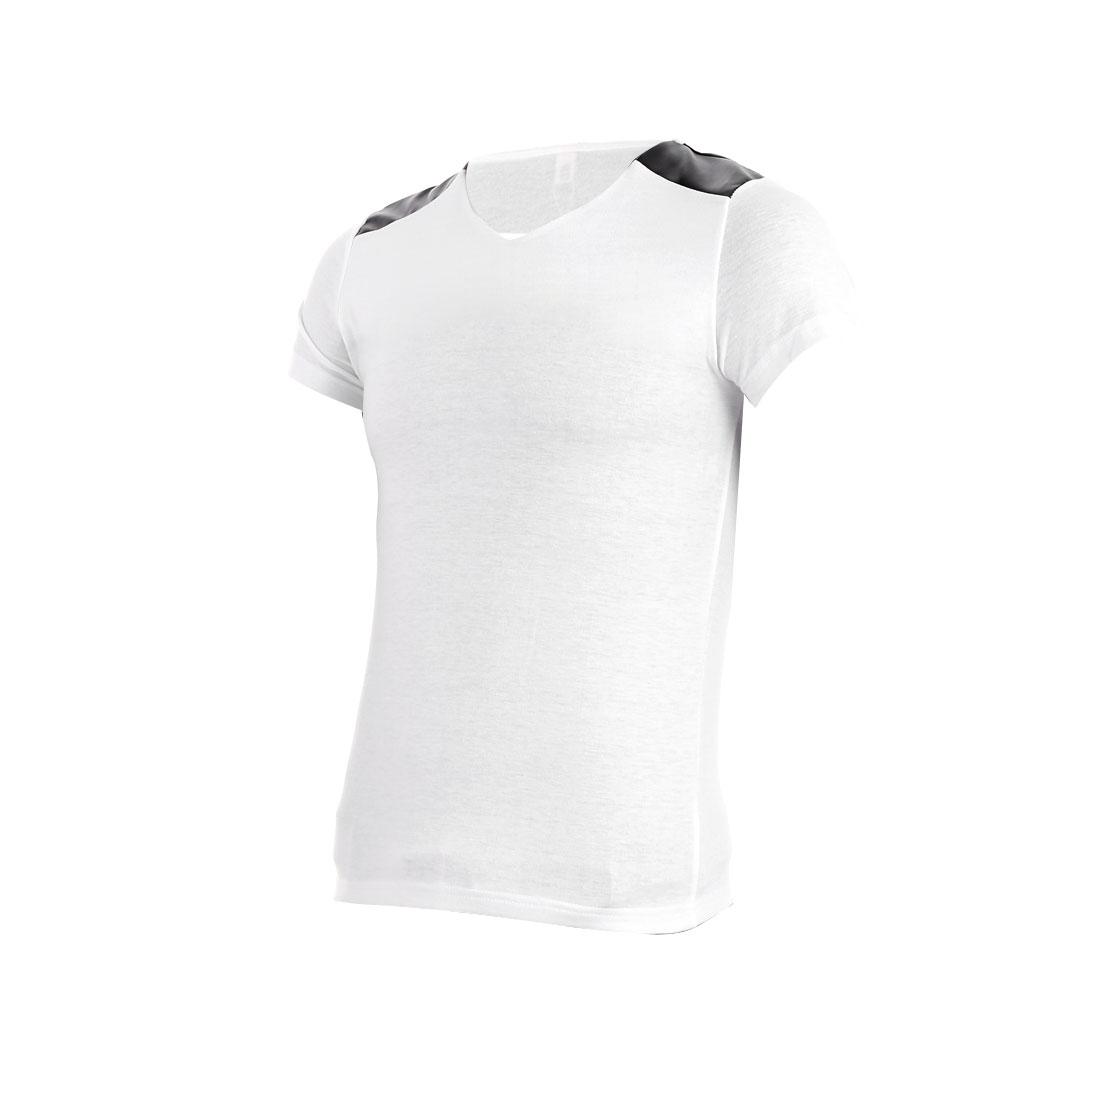 Men Faux Leather Panel Short Sleeve Fashion Shirt White S